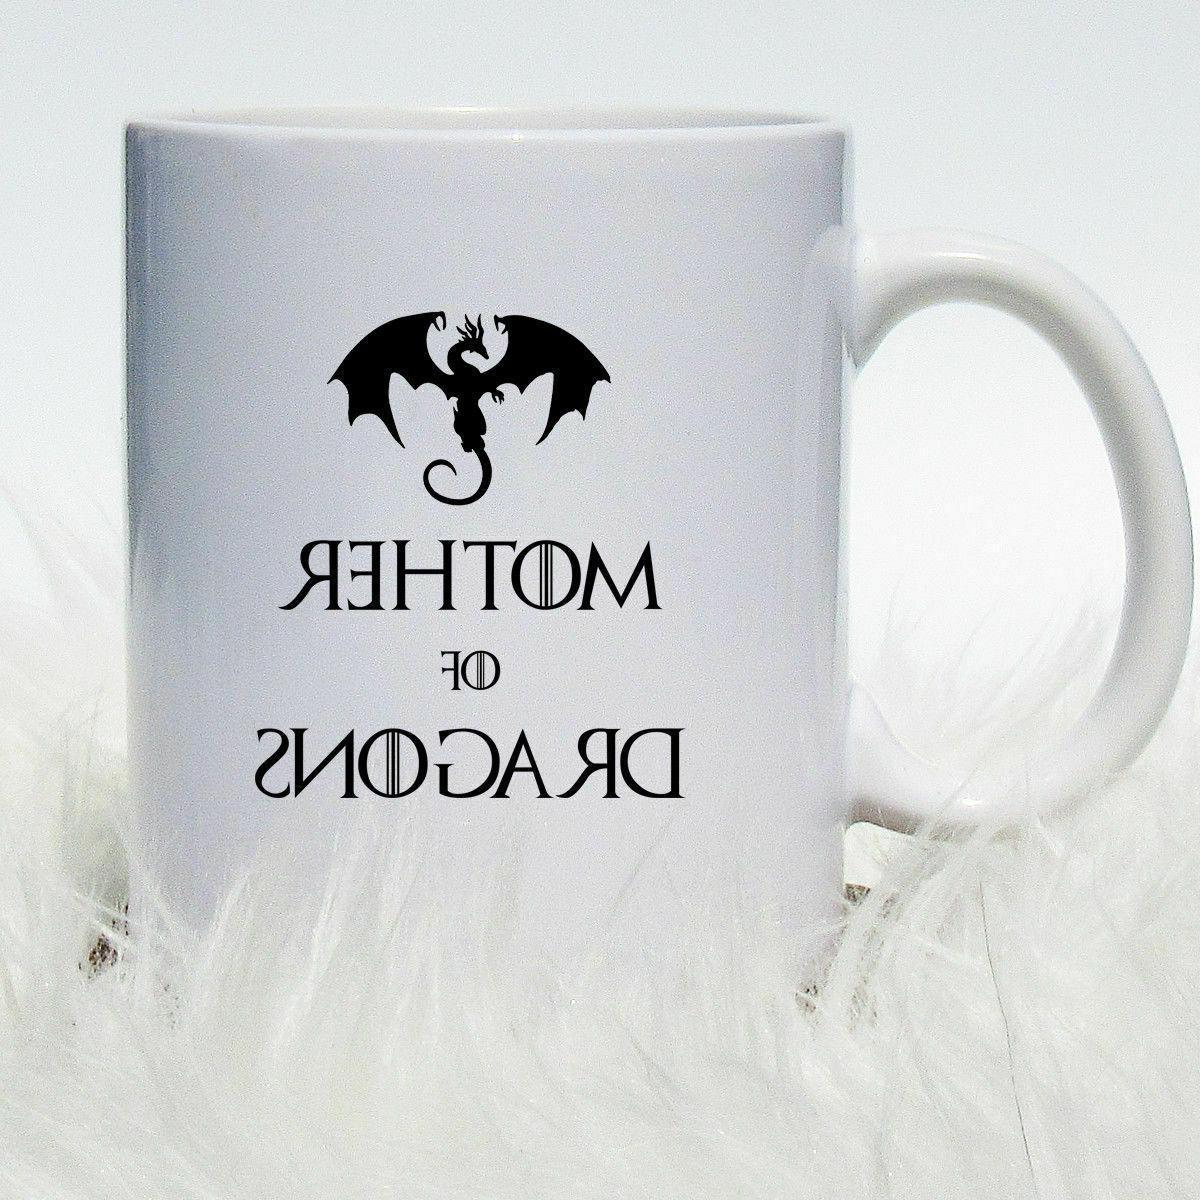 Mother of Dragons Coffee Mug - Game of Thrones Coffee Mug Kh